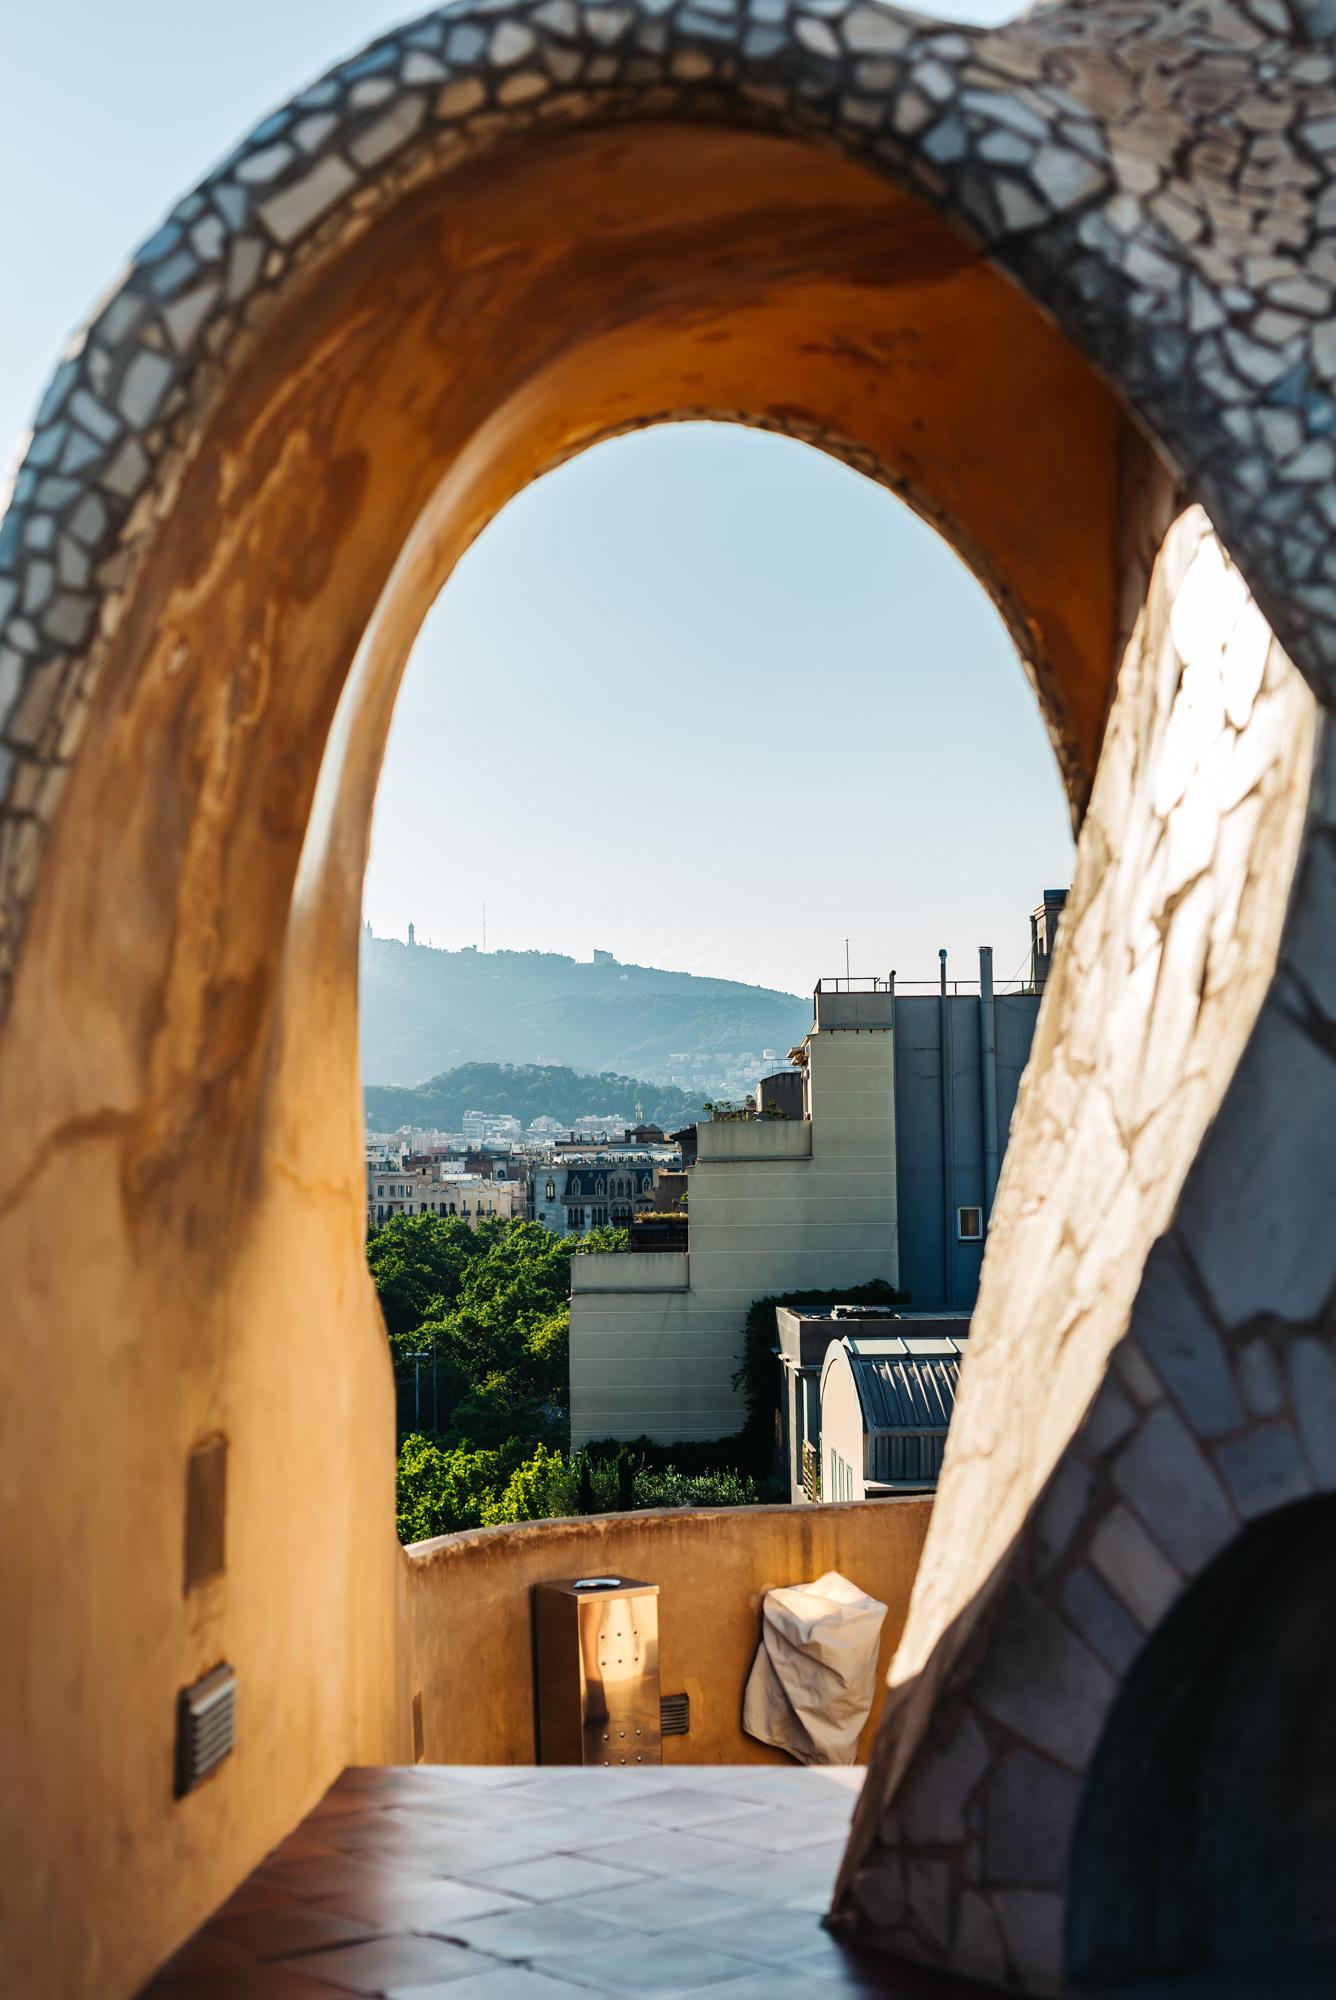 Gaudi liked to replicate nature in his work